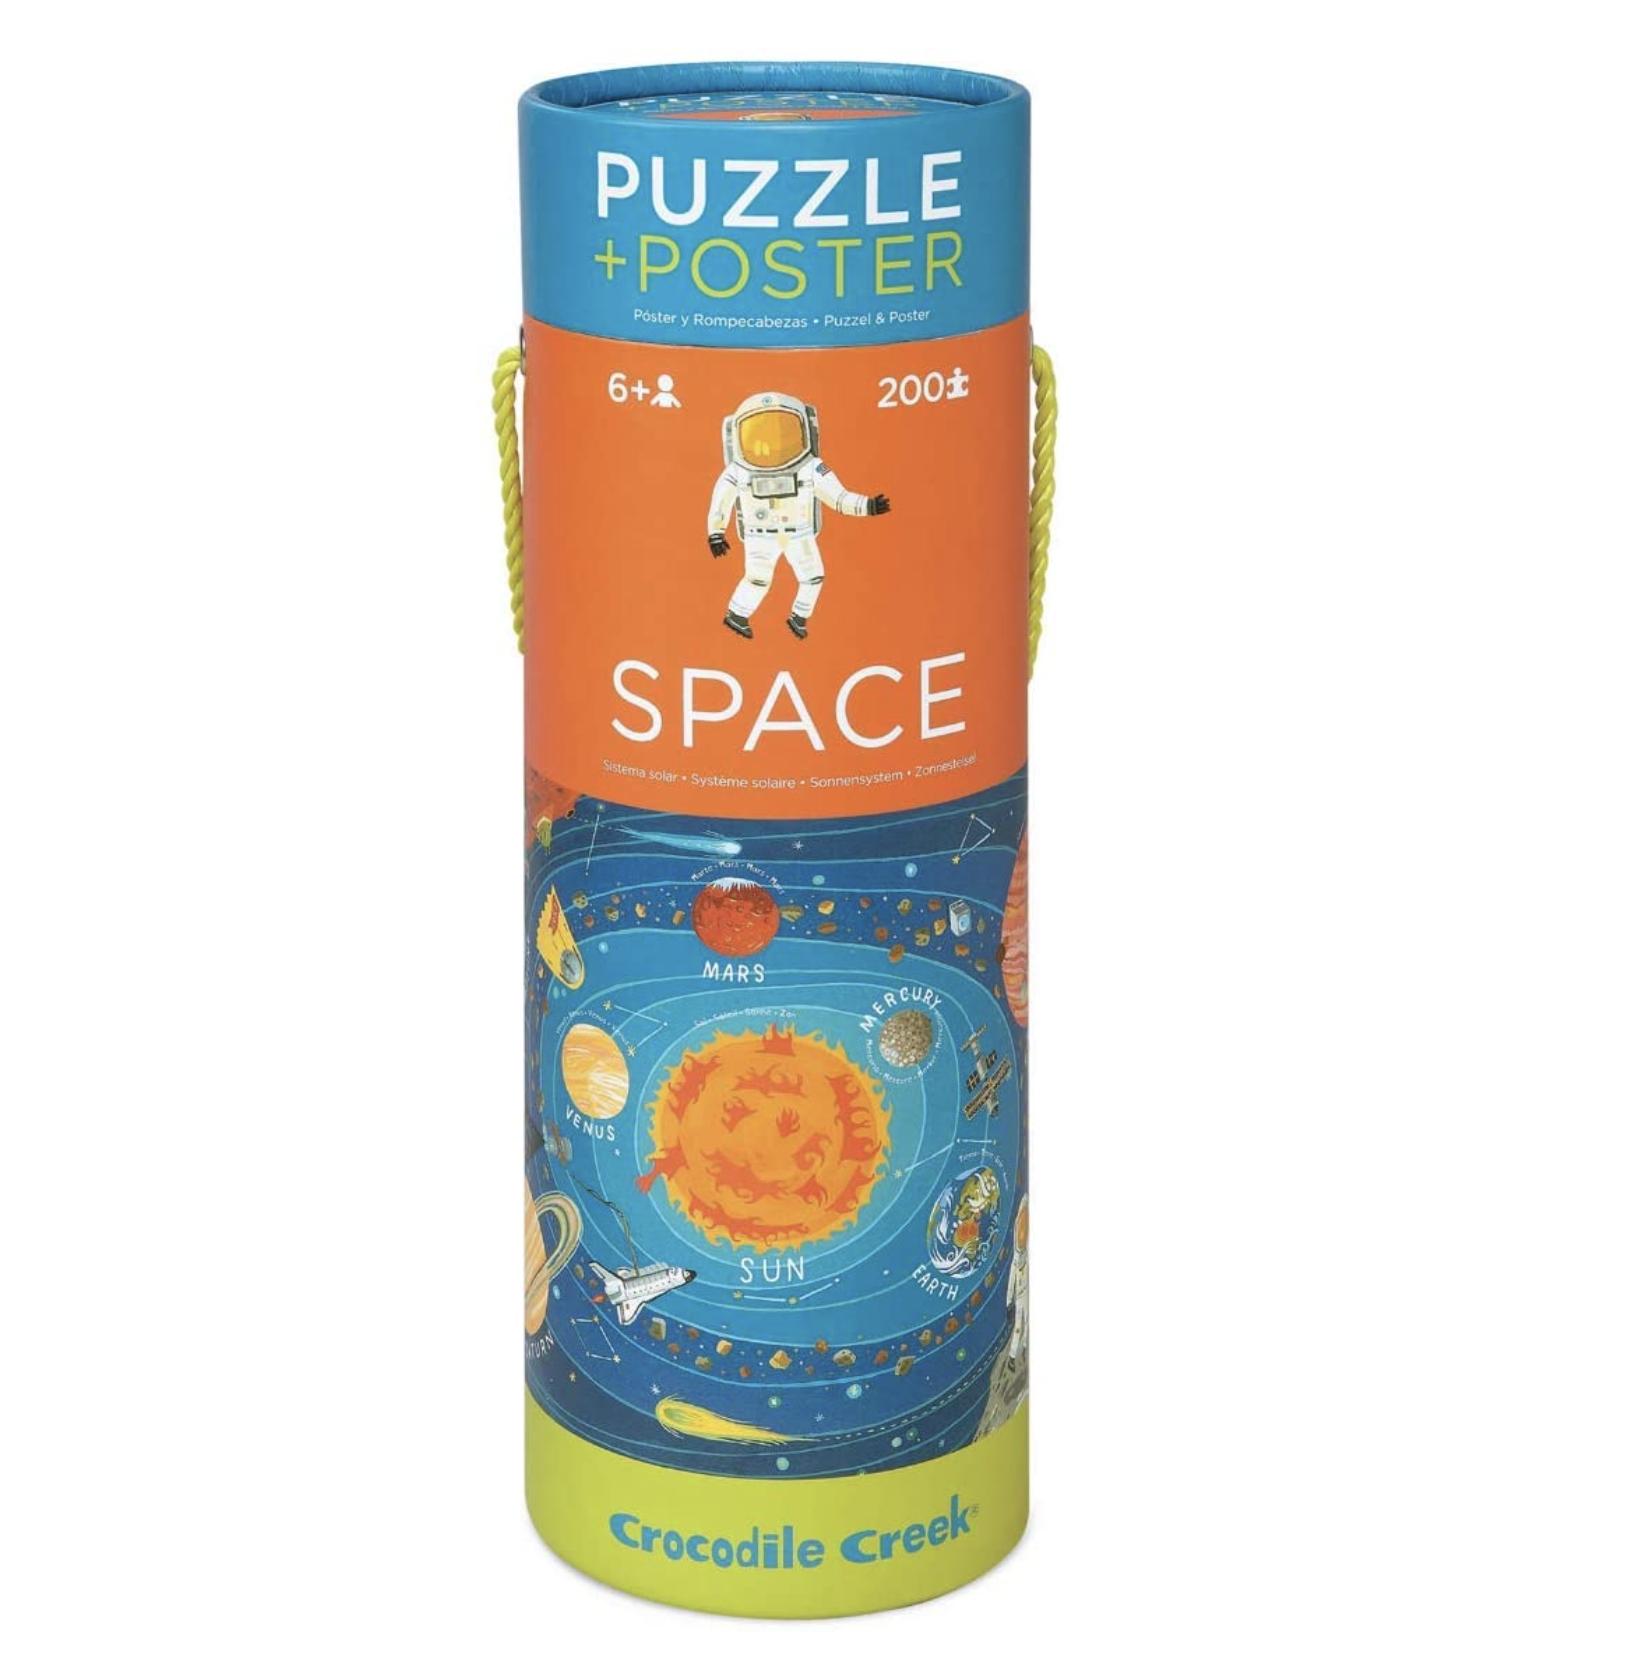 Crocodile Creek Space Puzzle + Poster 200 pc